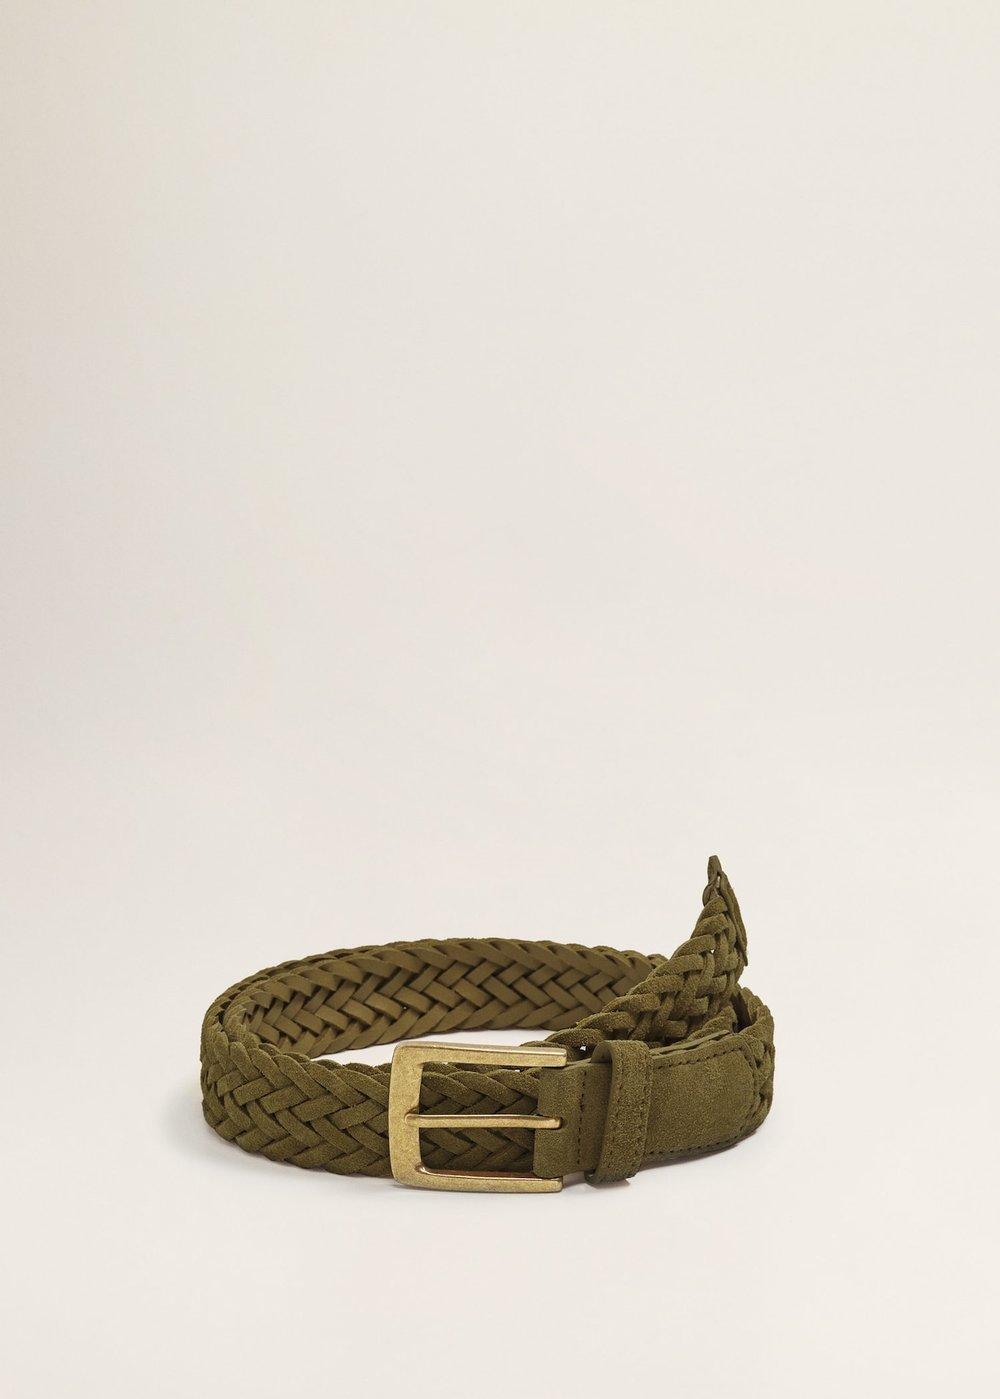 Belt $35